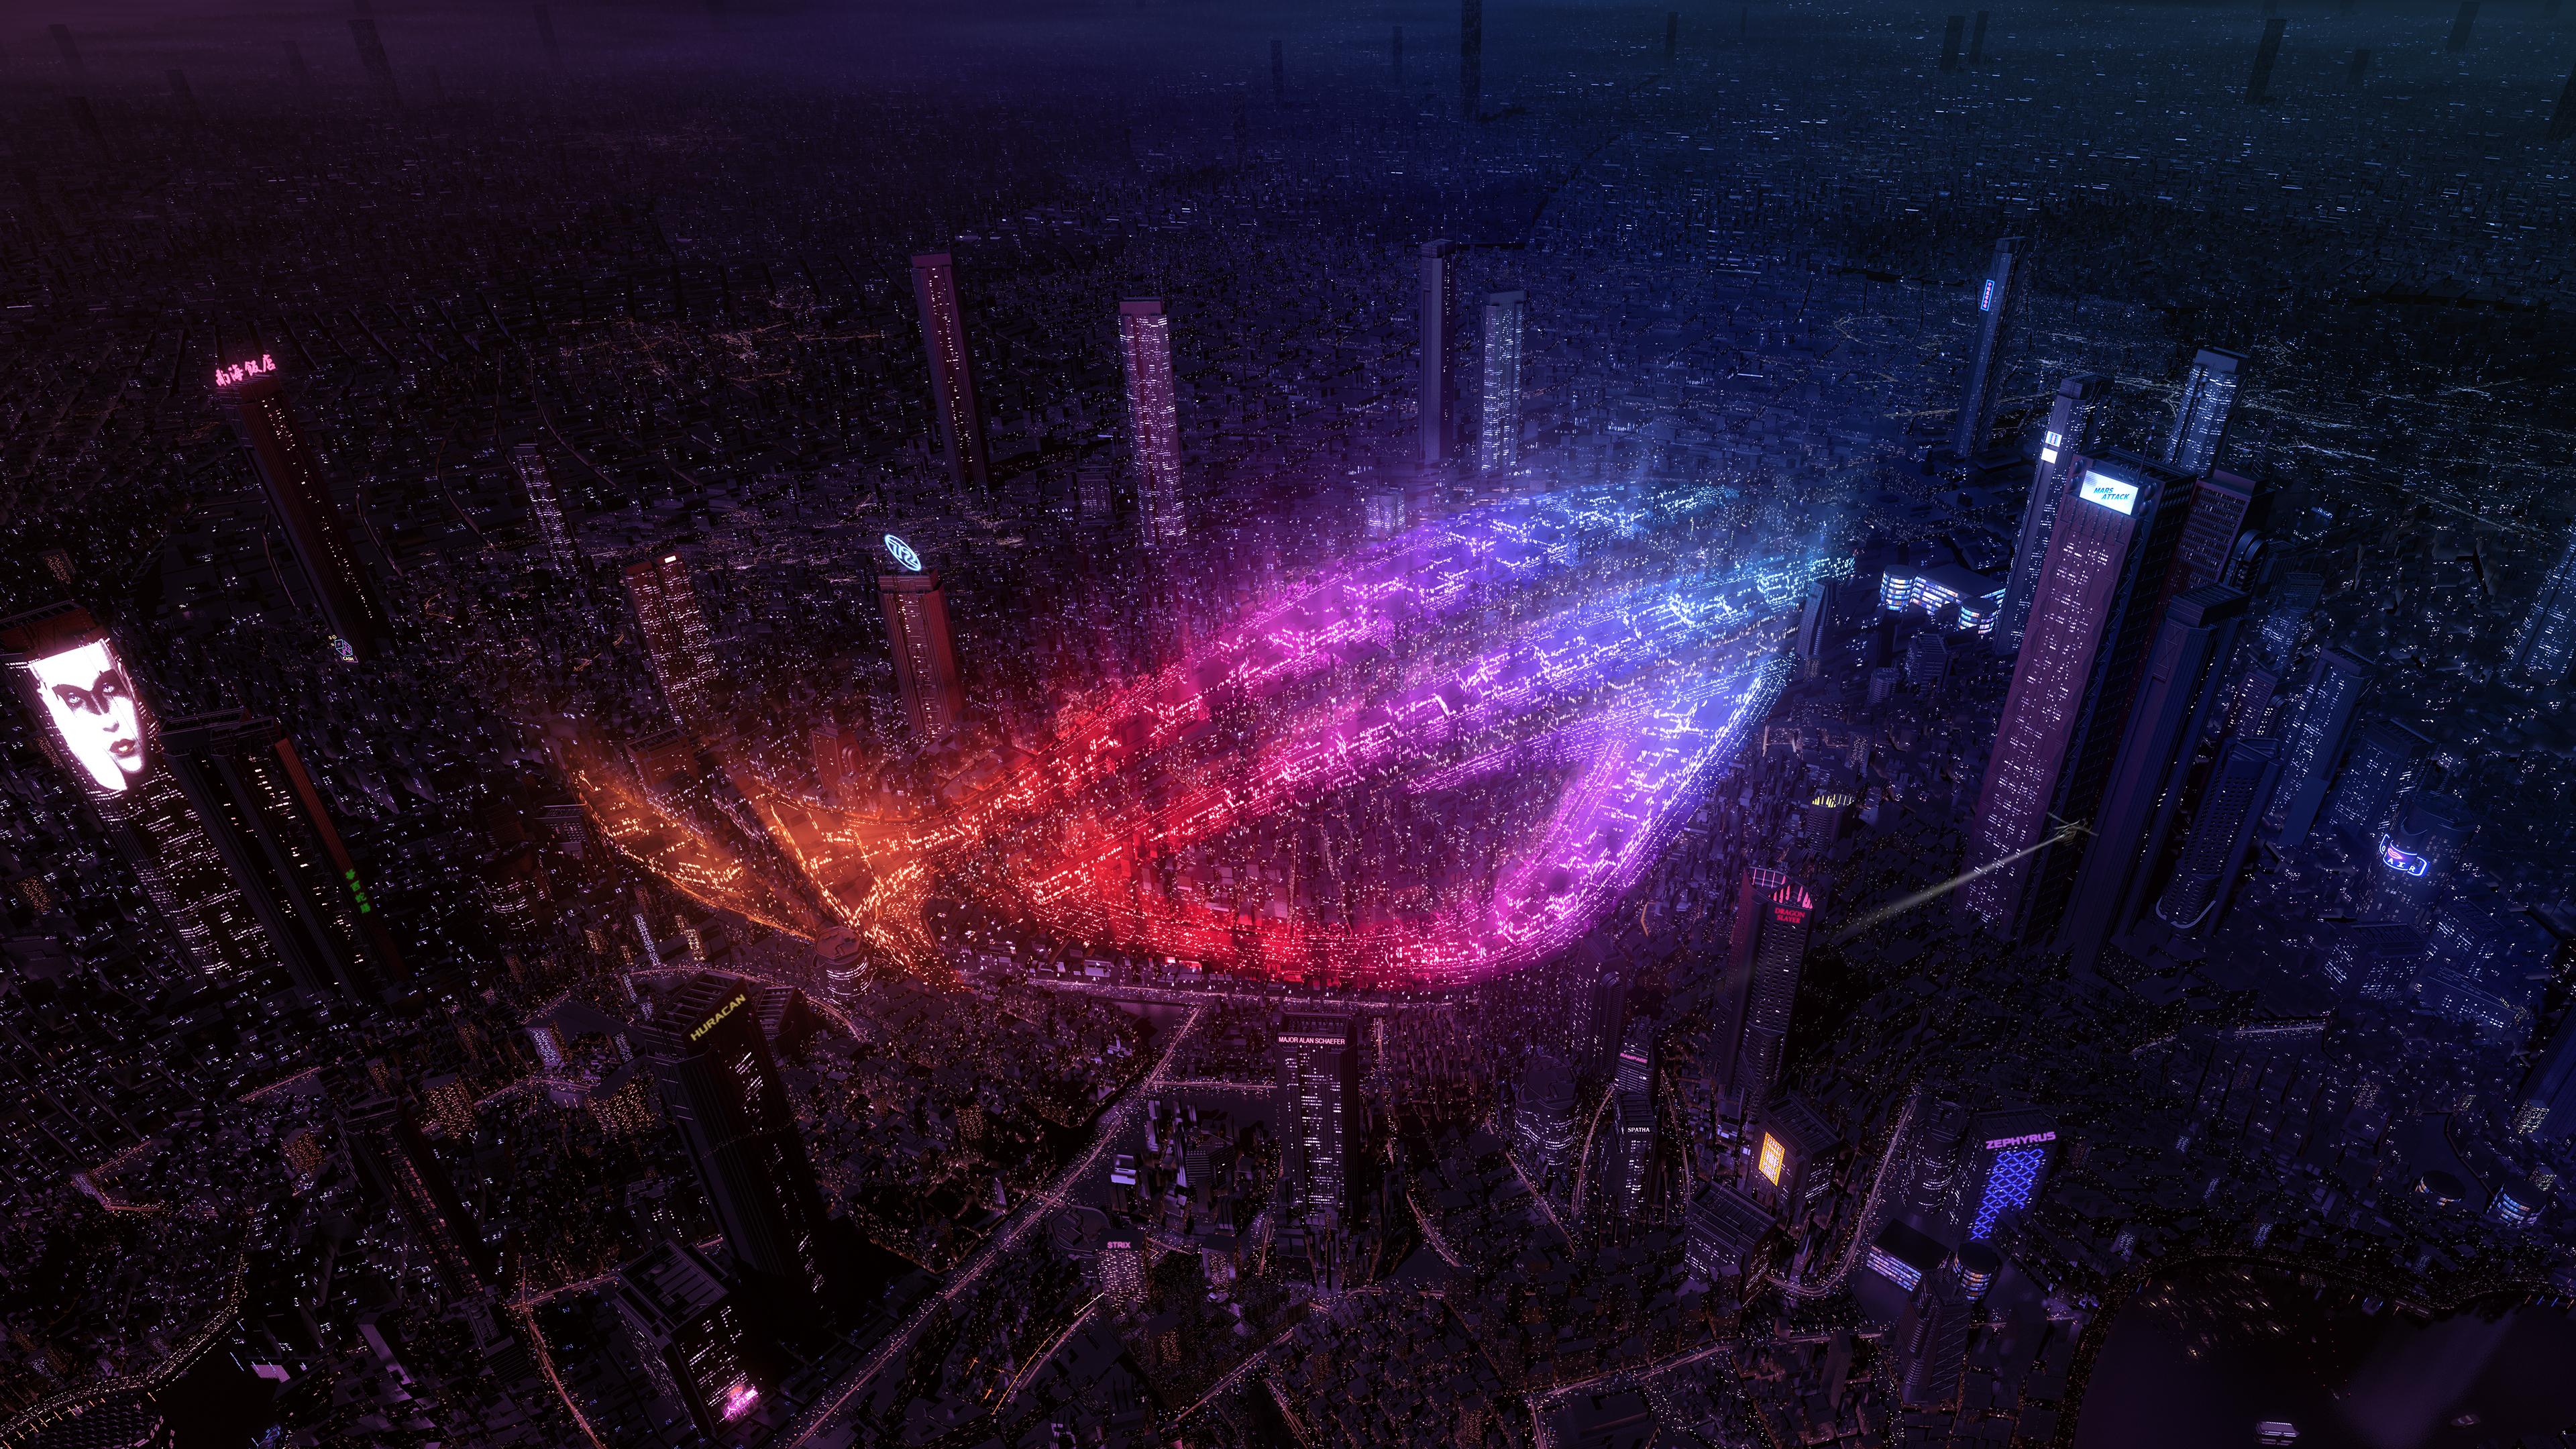 ASUS ROG, Republic of Gamers, City Lights, 4K, Creative Graphics